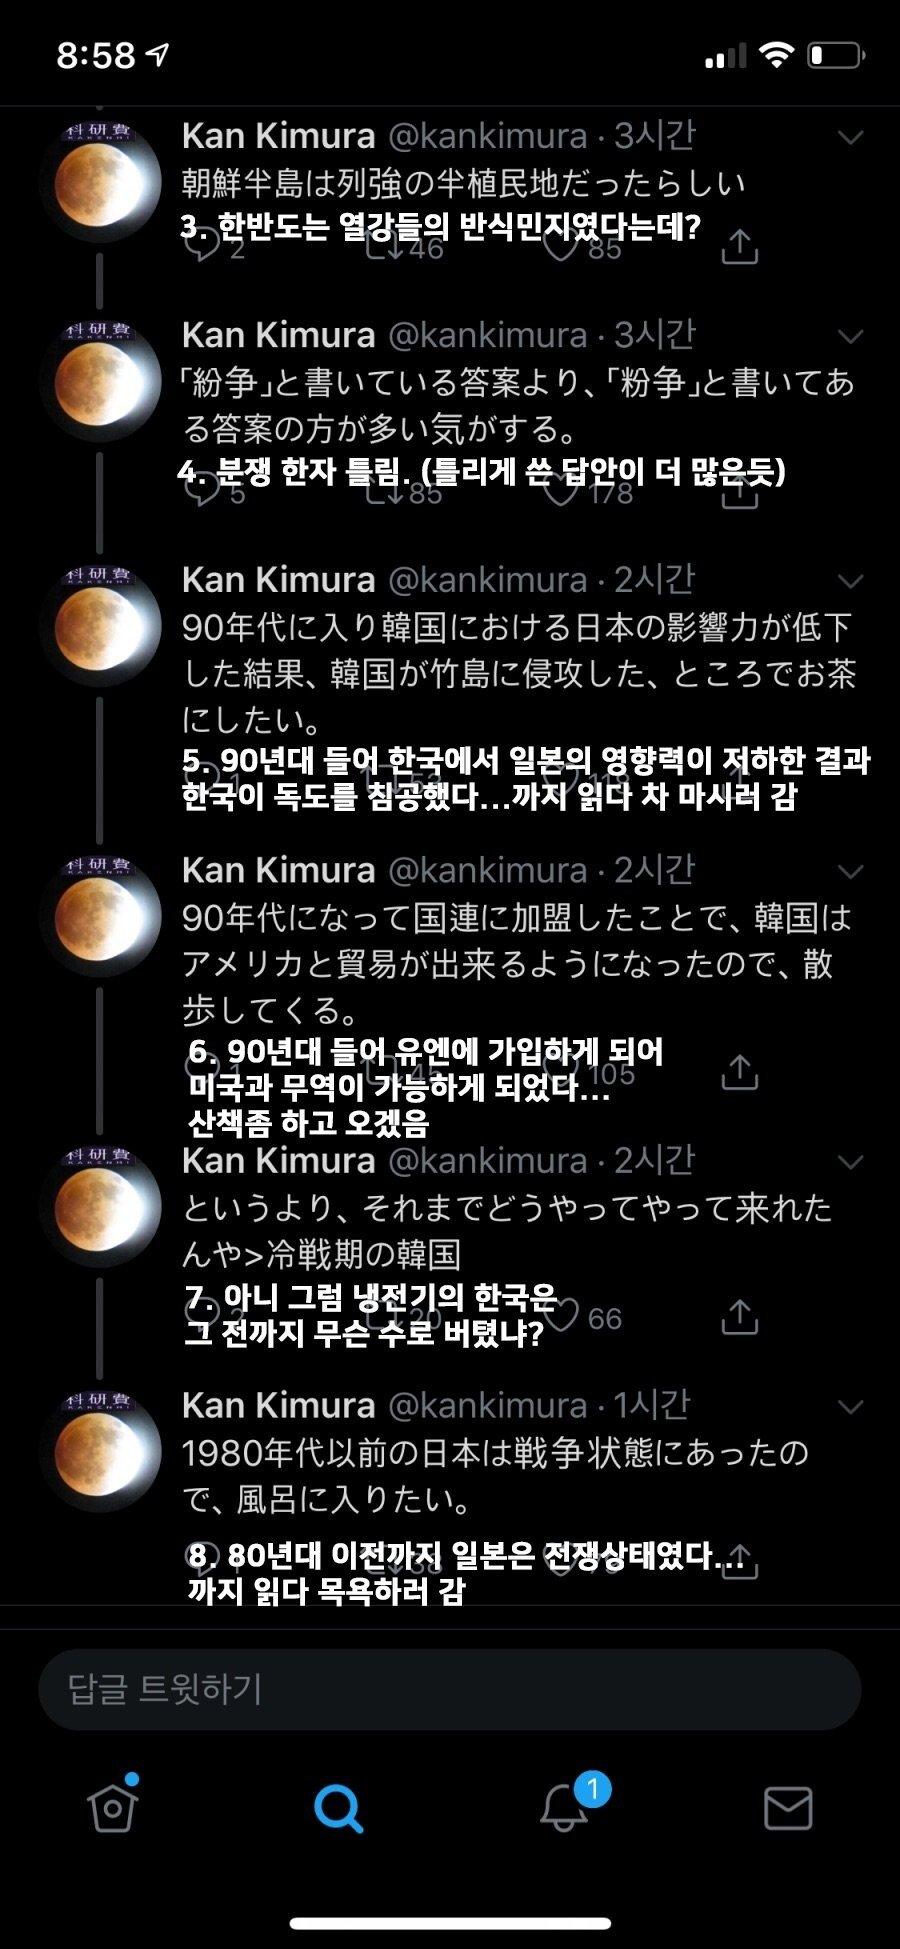 IMG_20191203_232745.jpg 일본대학 한국학 교수의 고통